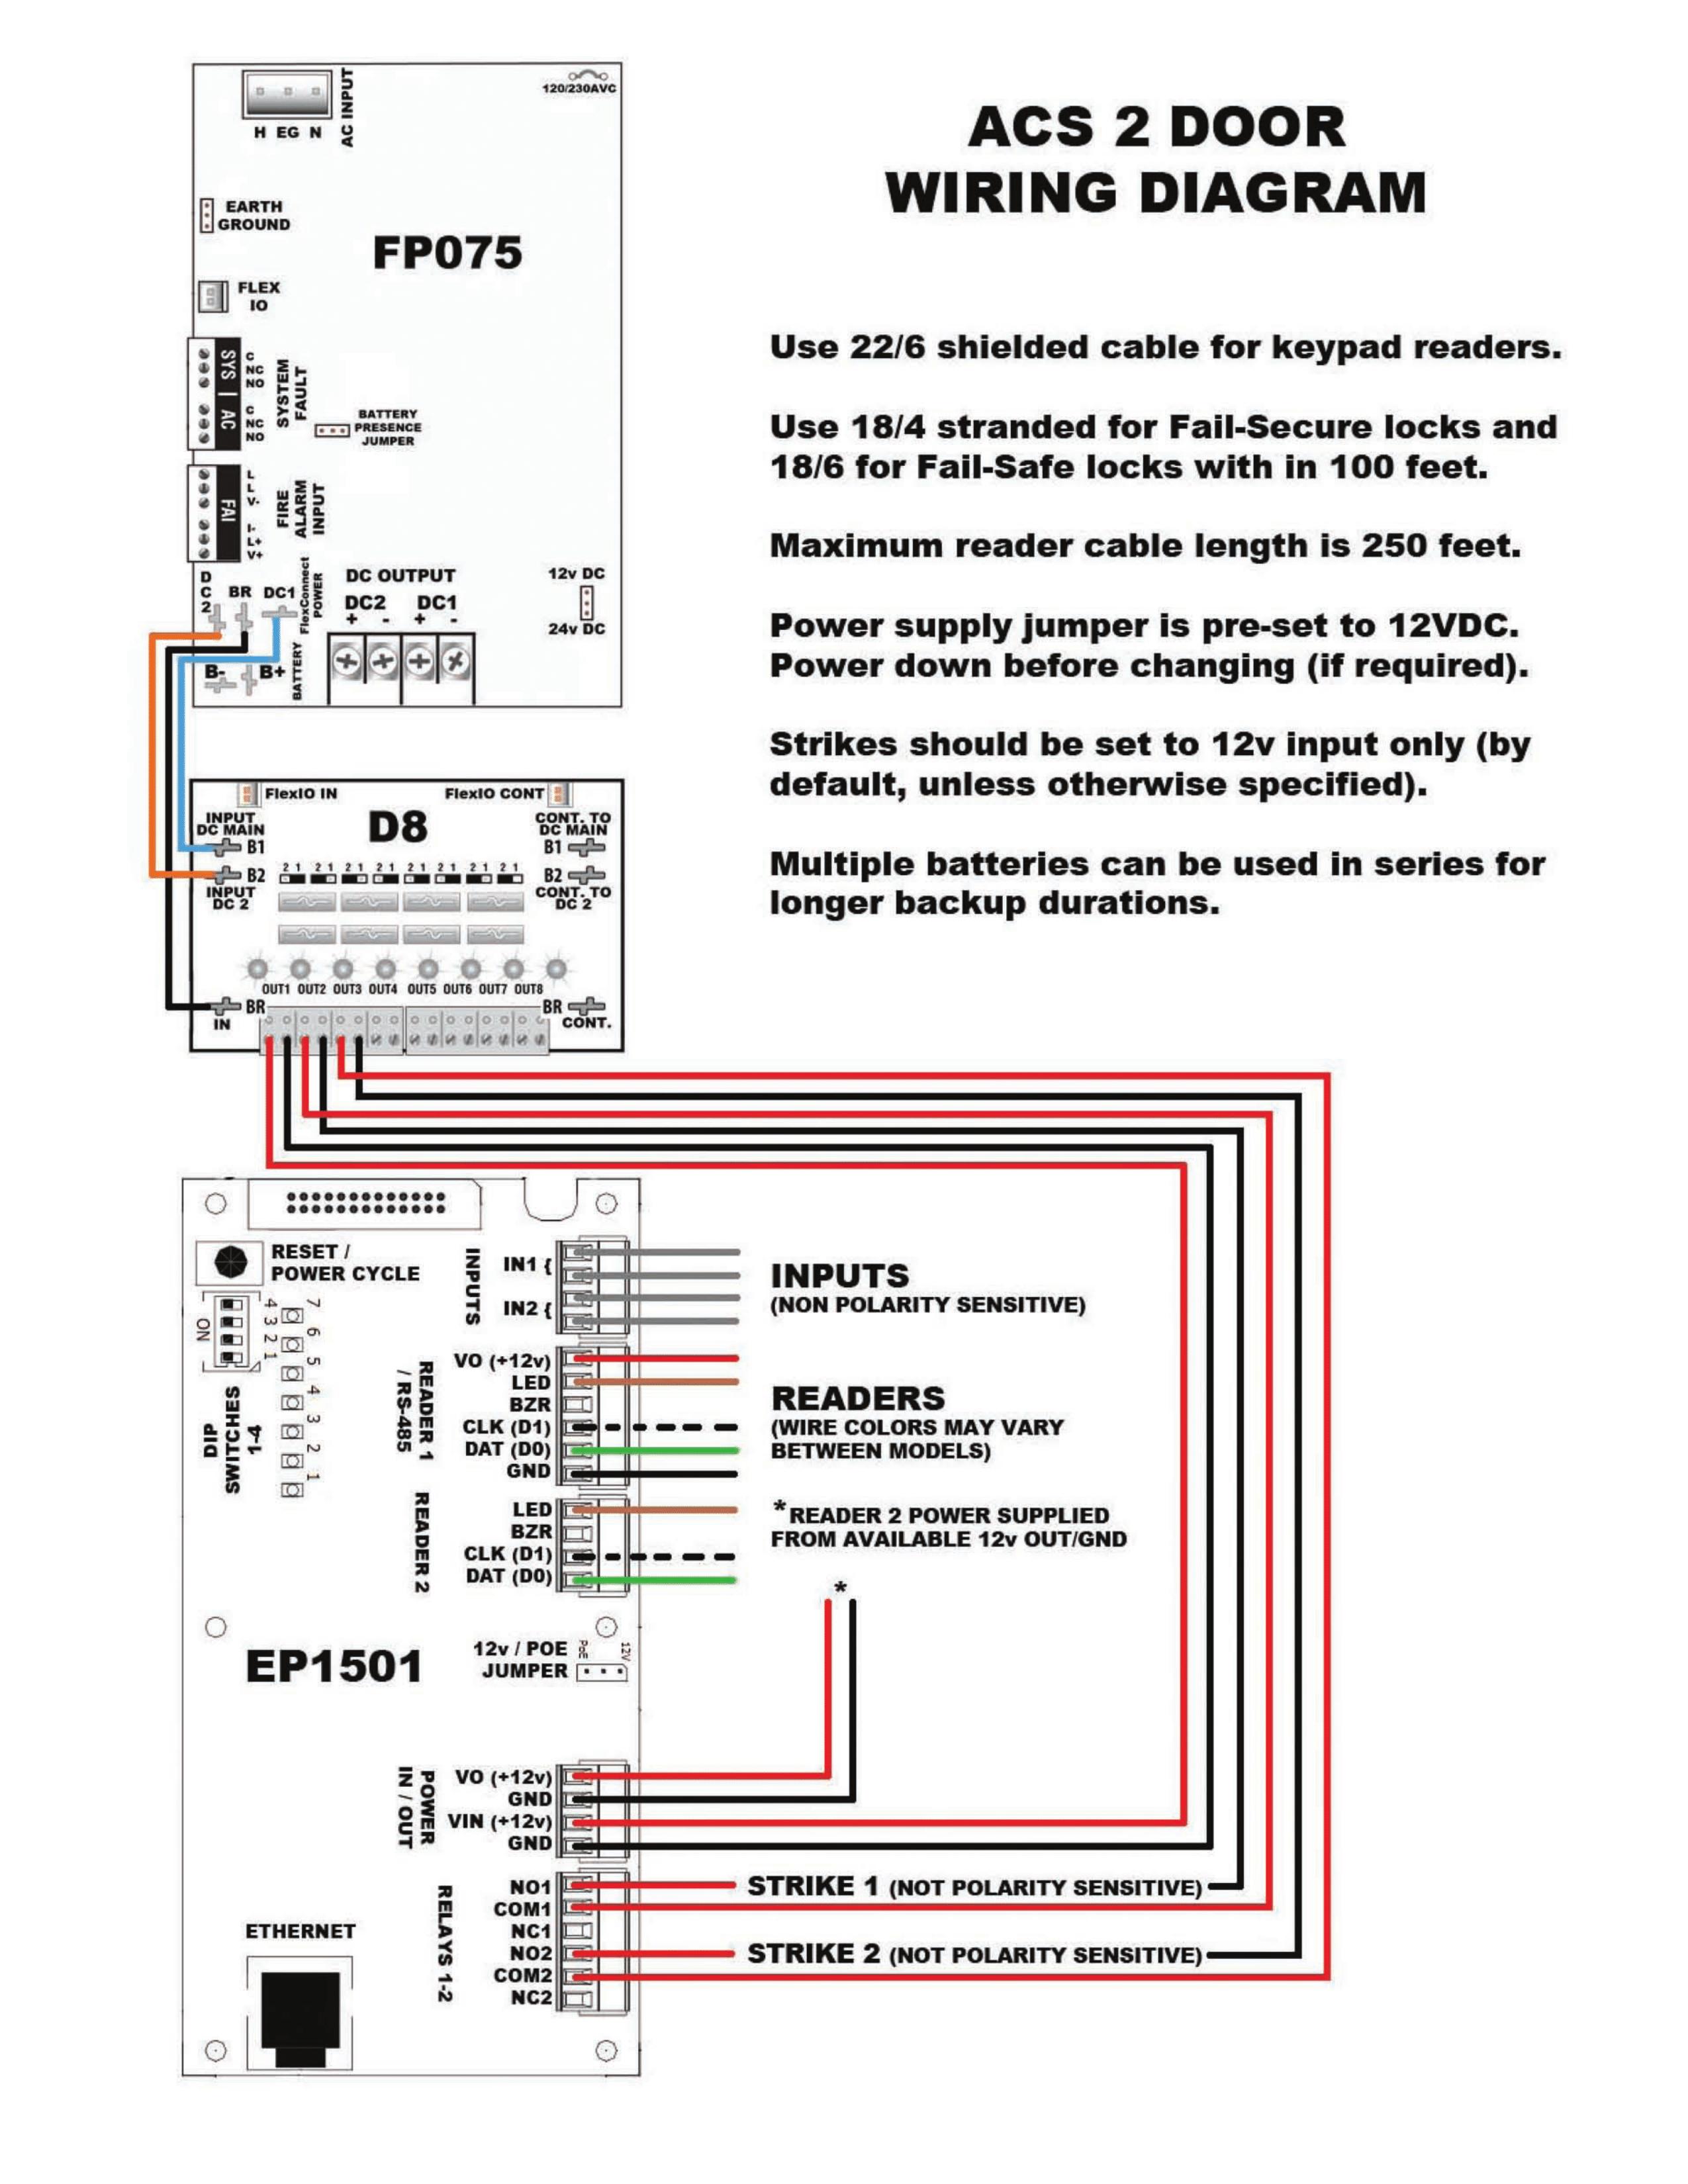 acs 2 door wiring diagram (ep1501) remotelock door wiring diagram 2017 ford fusion acs hardware manuals and diagrams